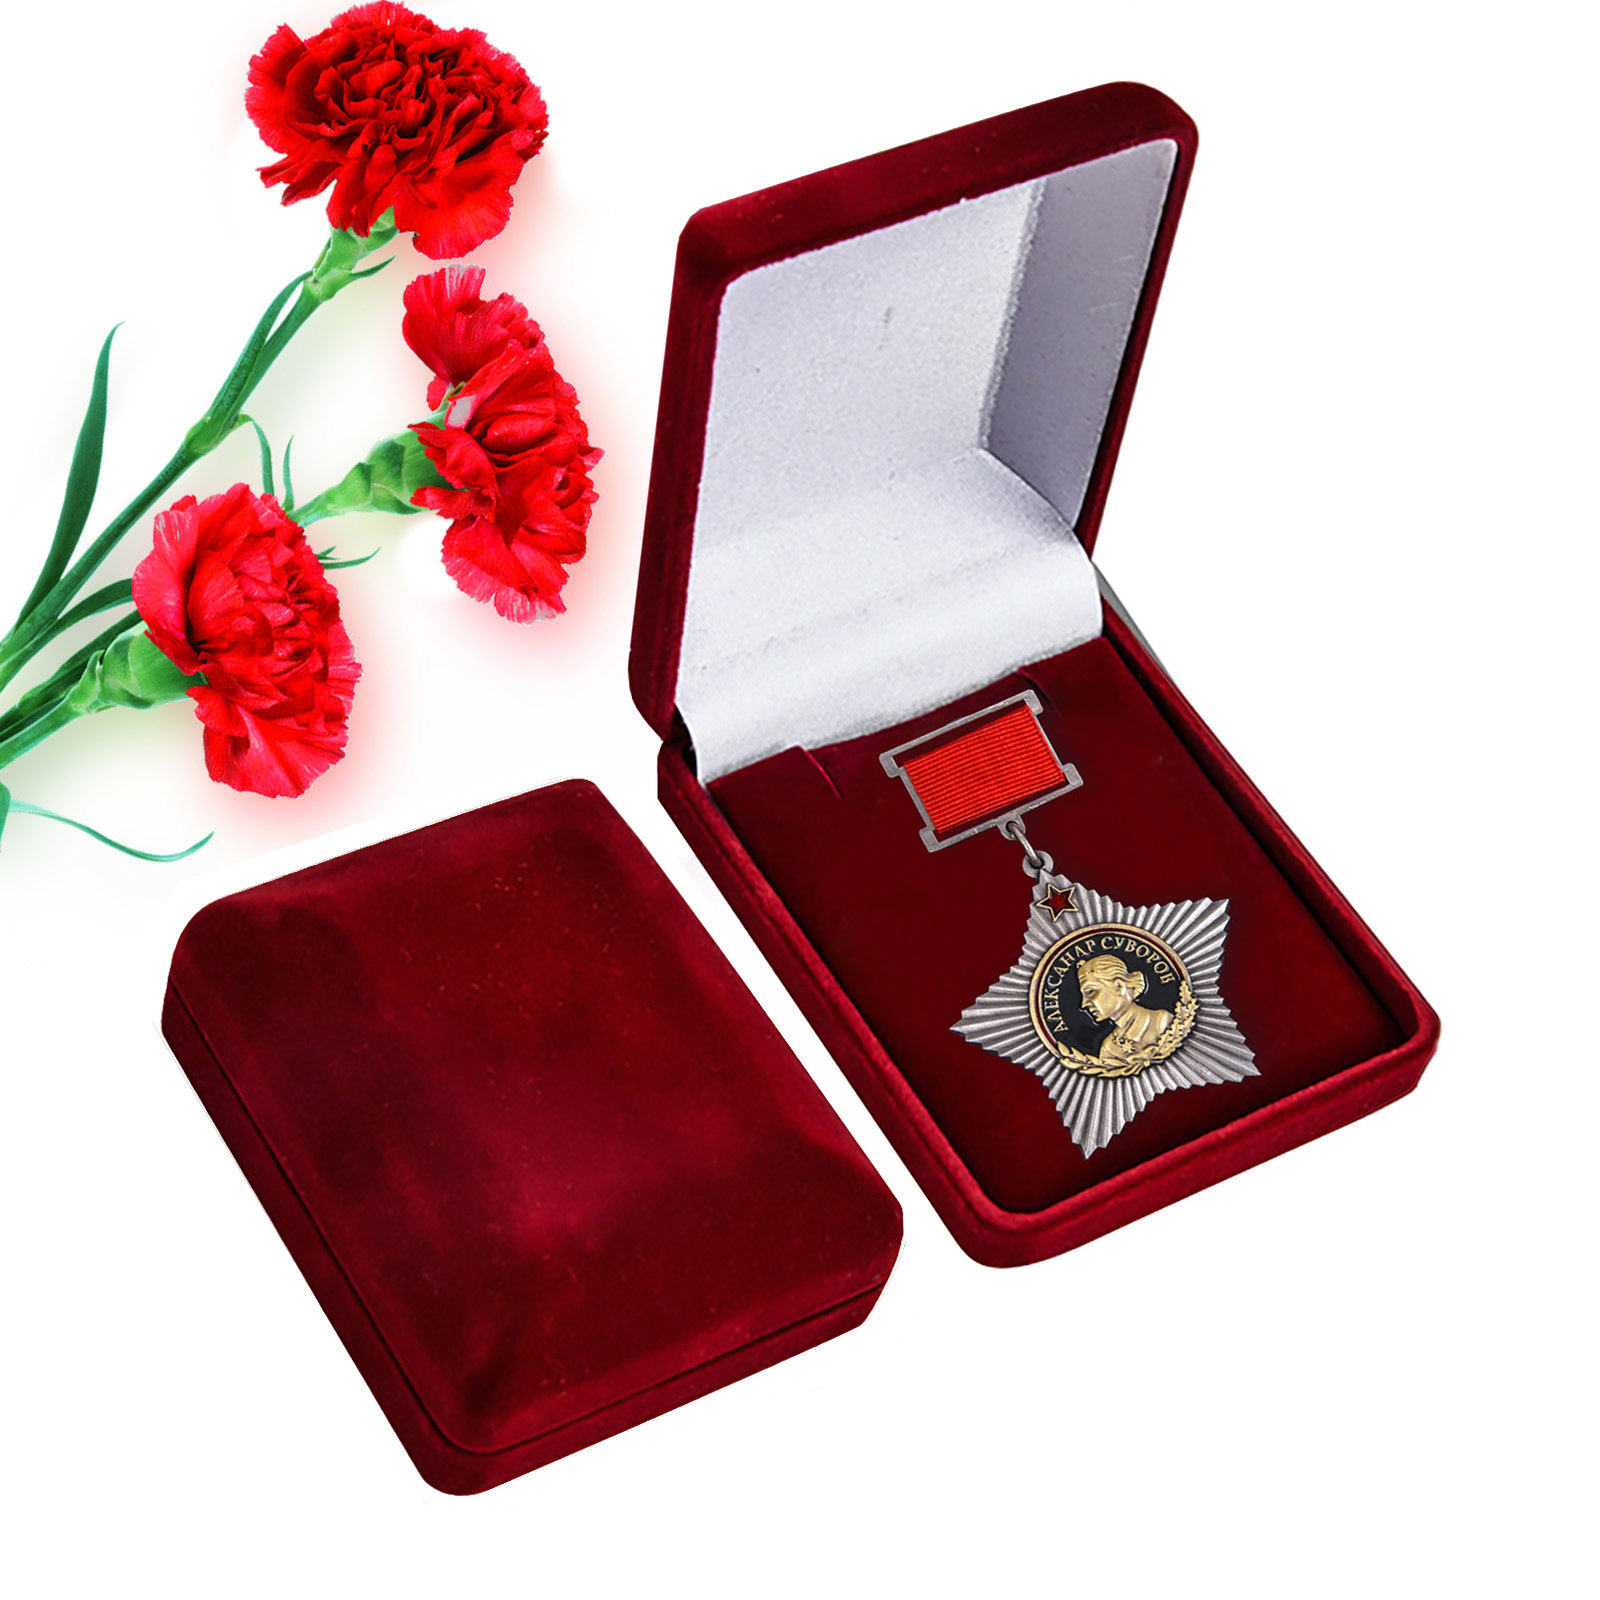 Муляж ордена Суворова 1 степени на колодке